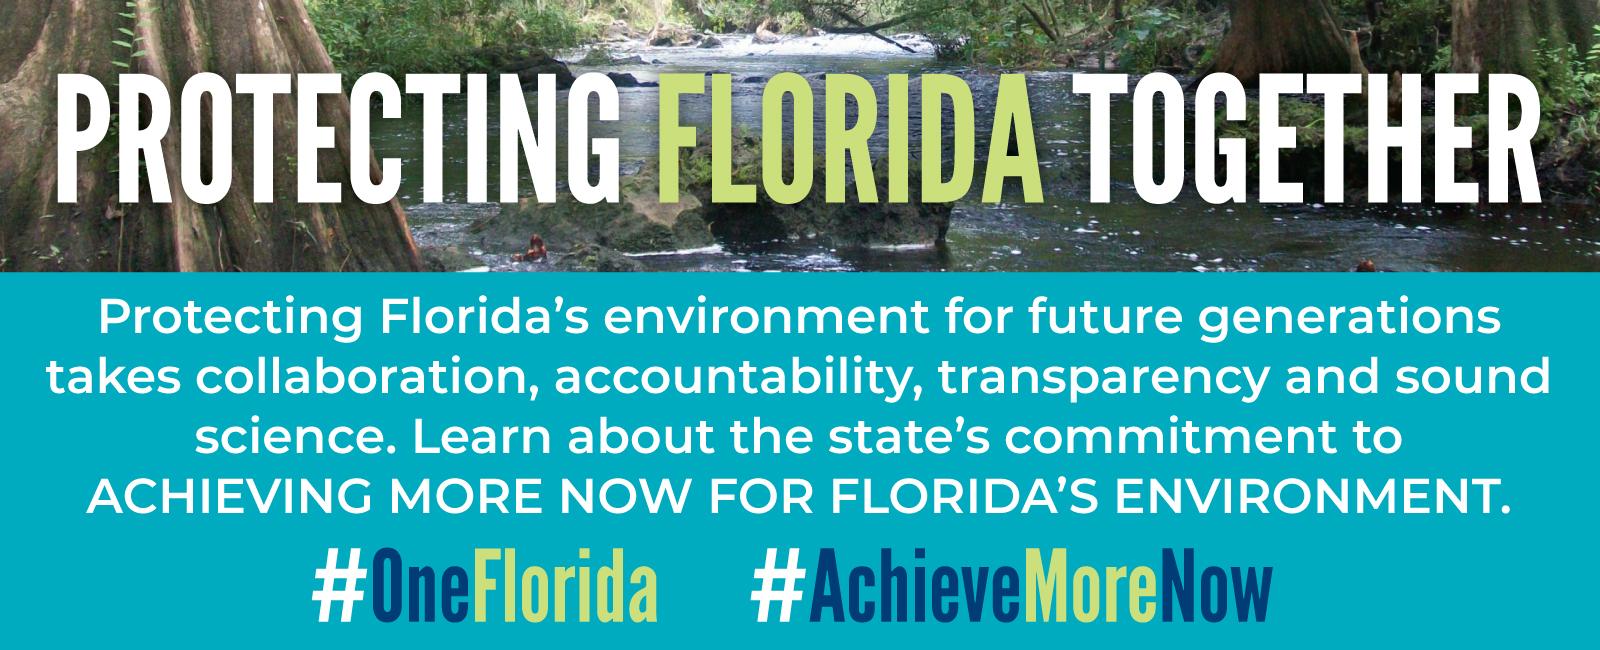 Protecting Florida Together